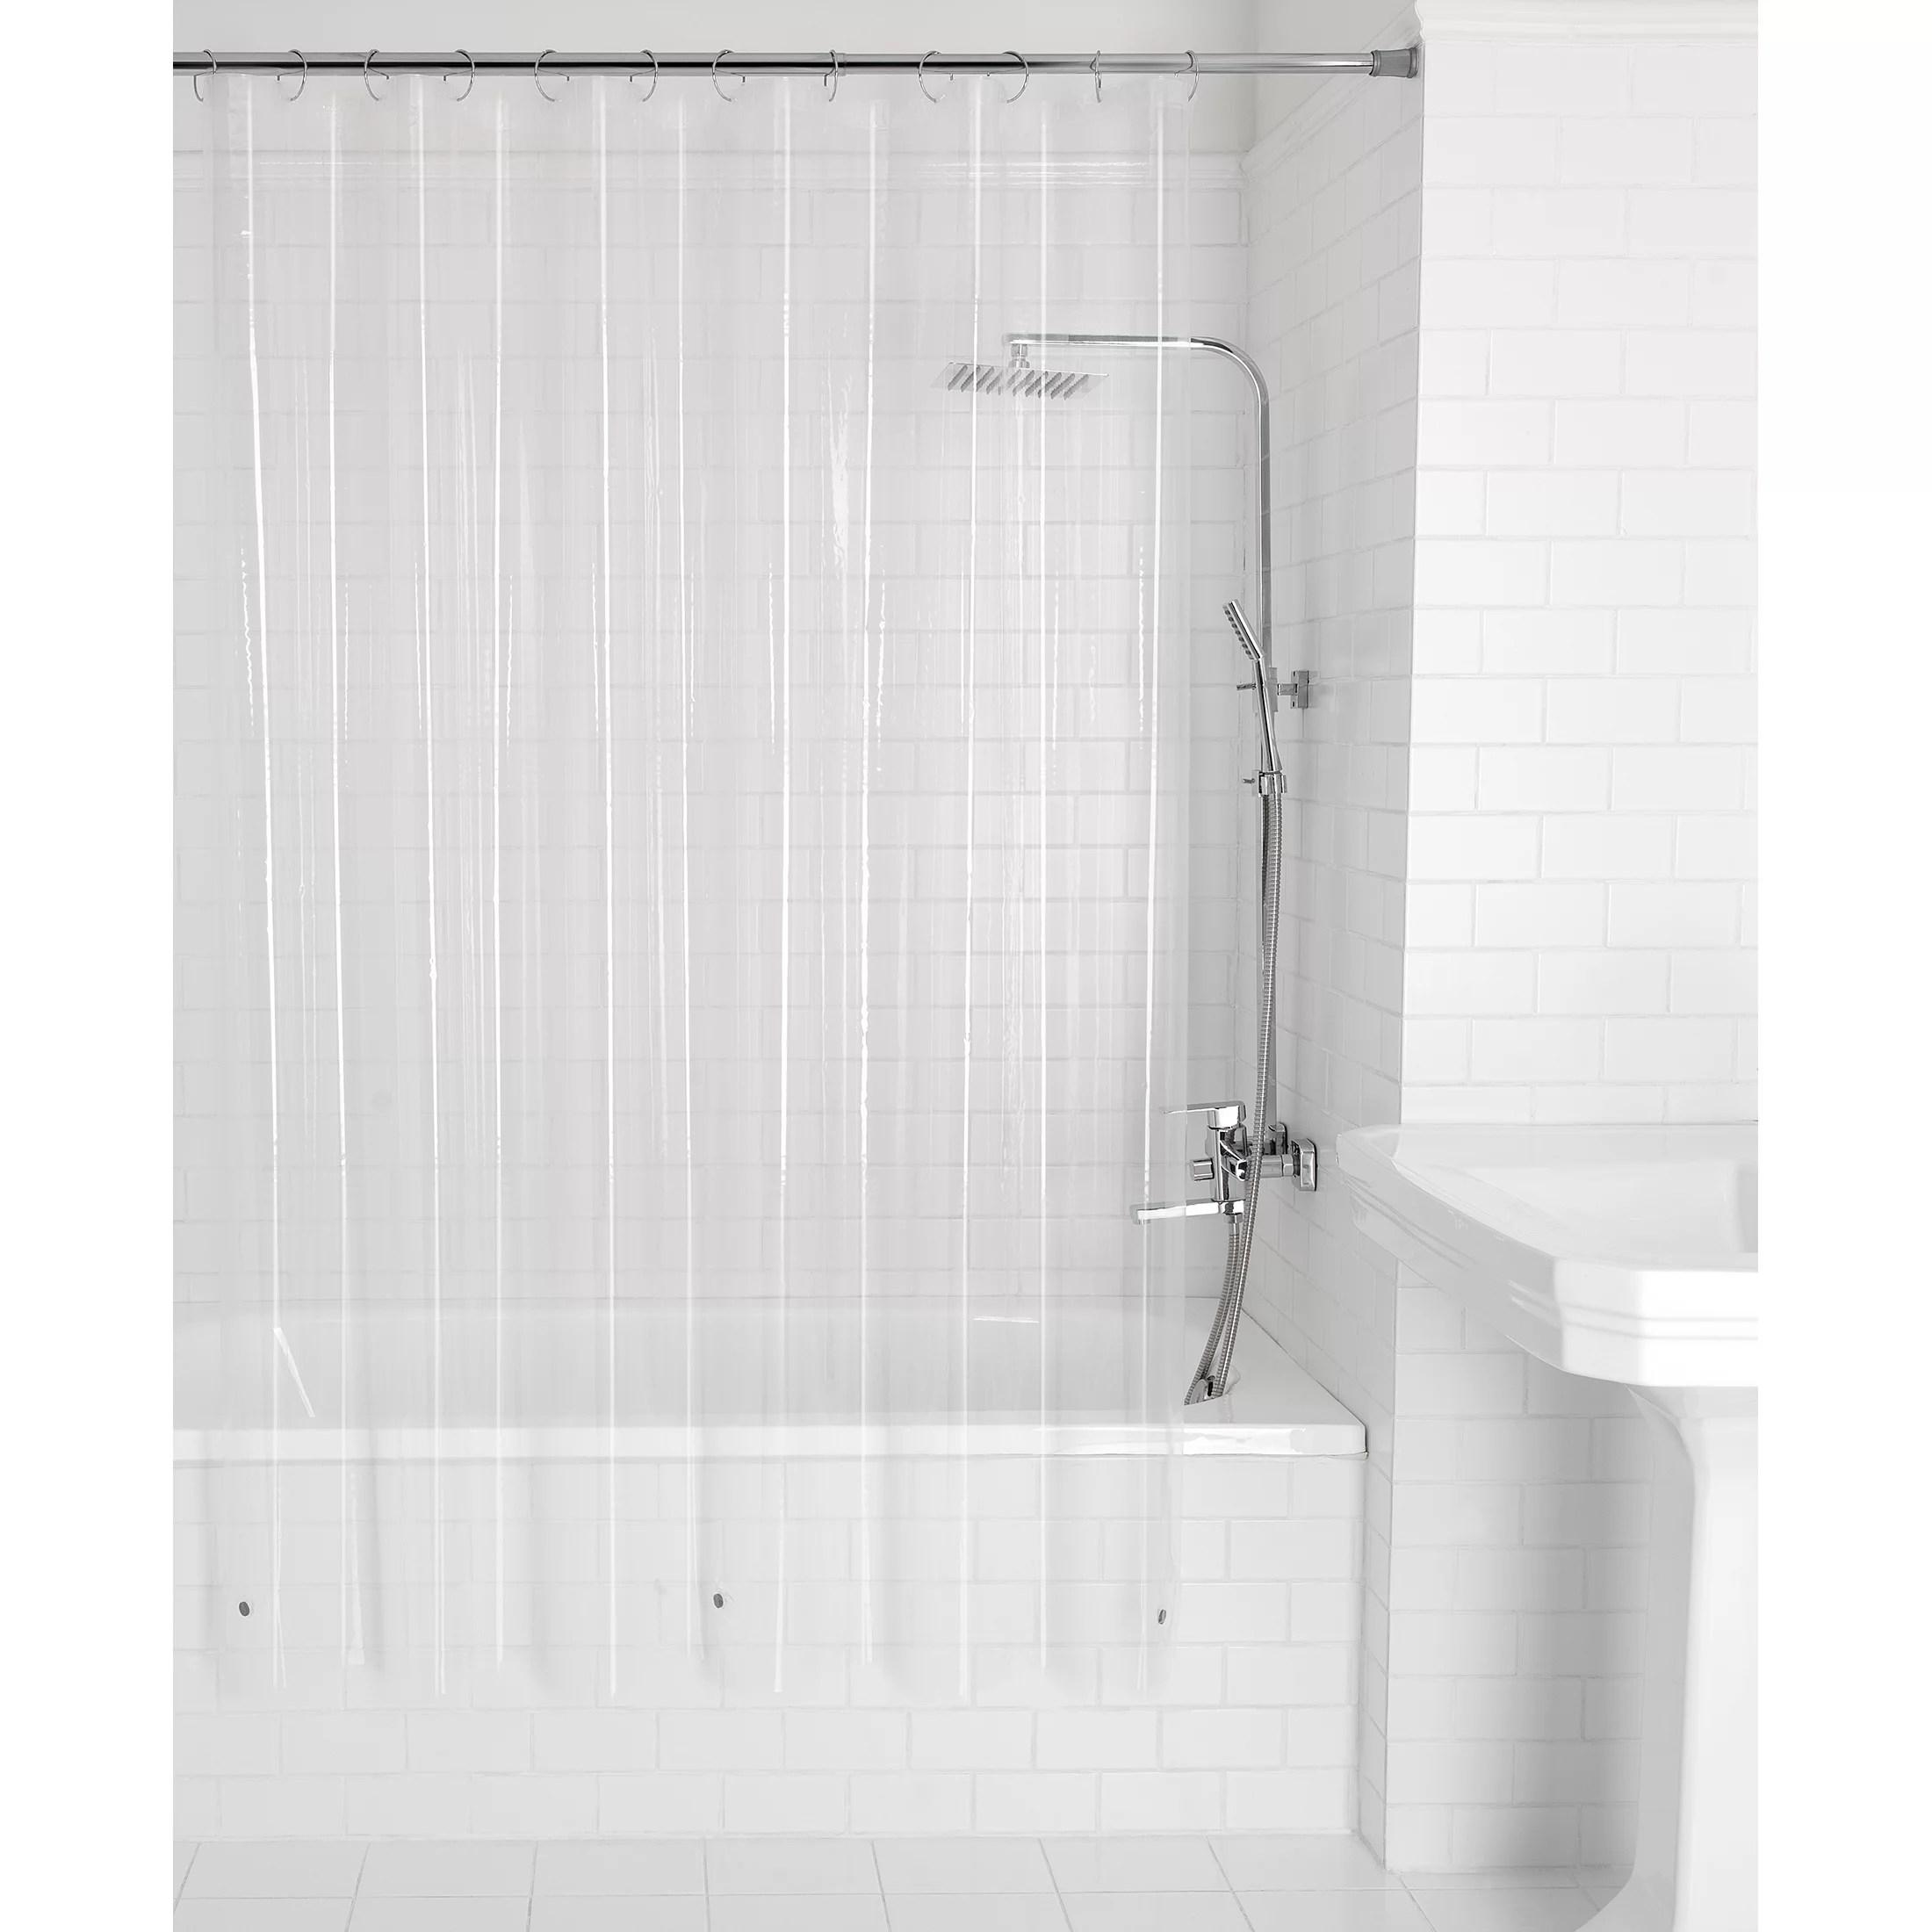 mainstays light weight frosty shower liner 1 each